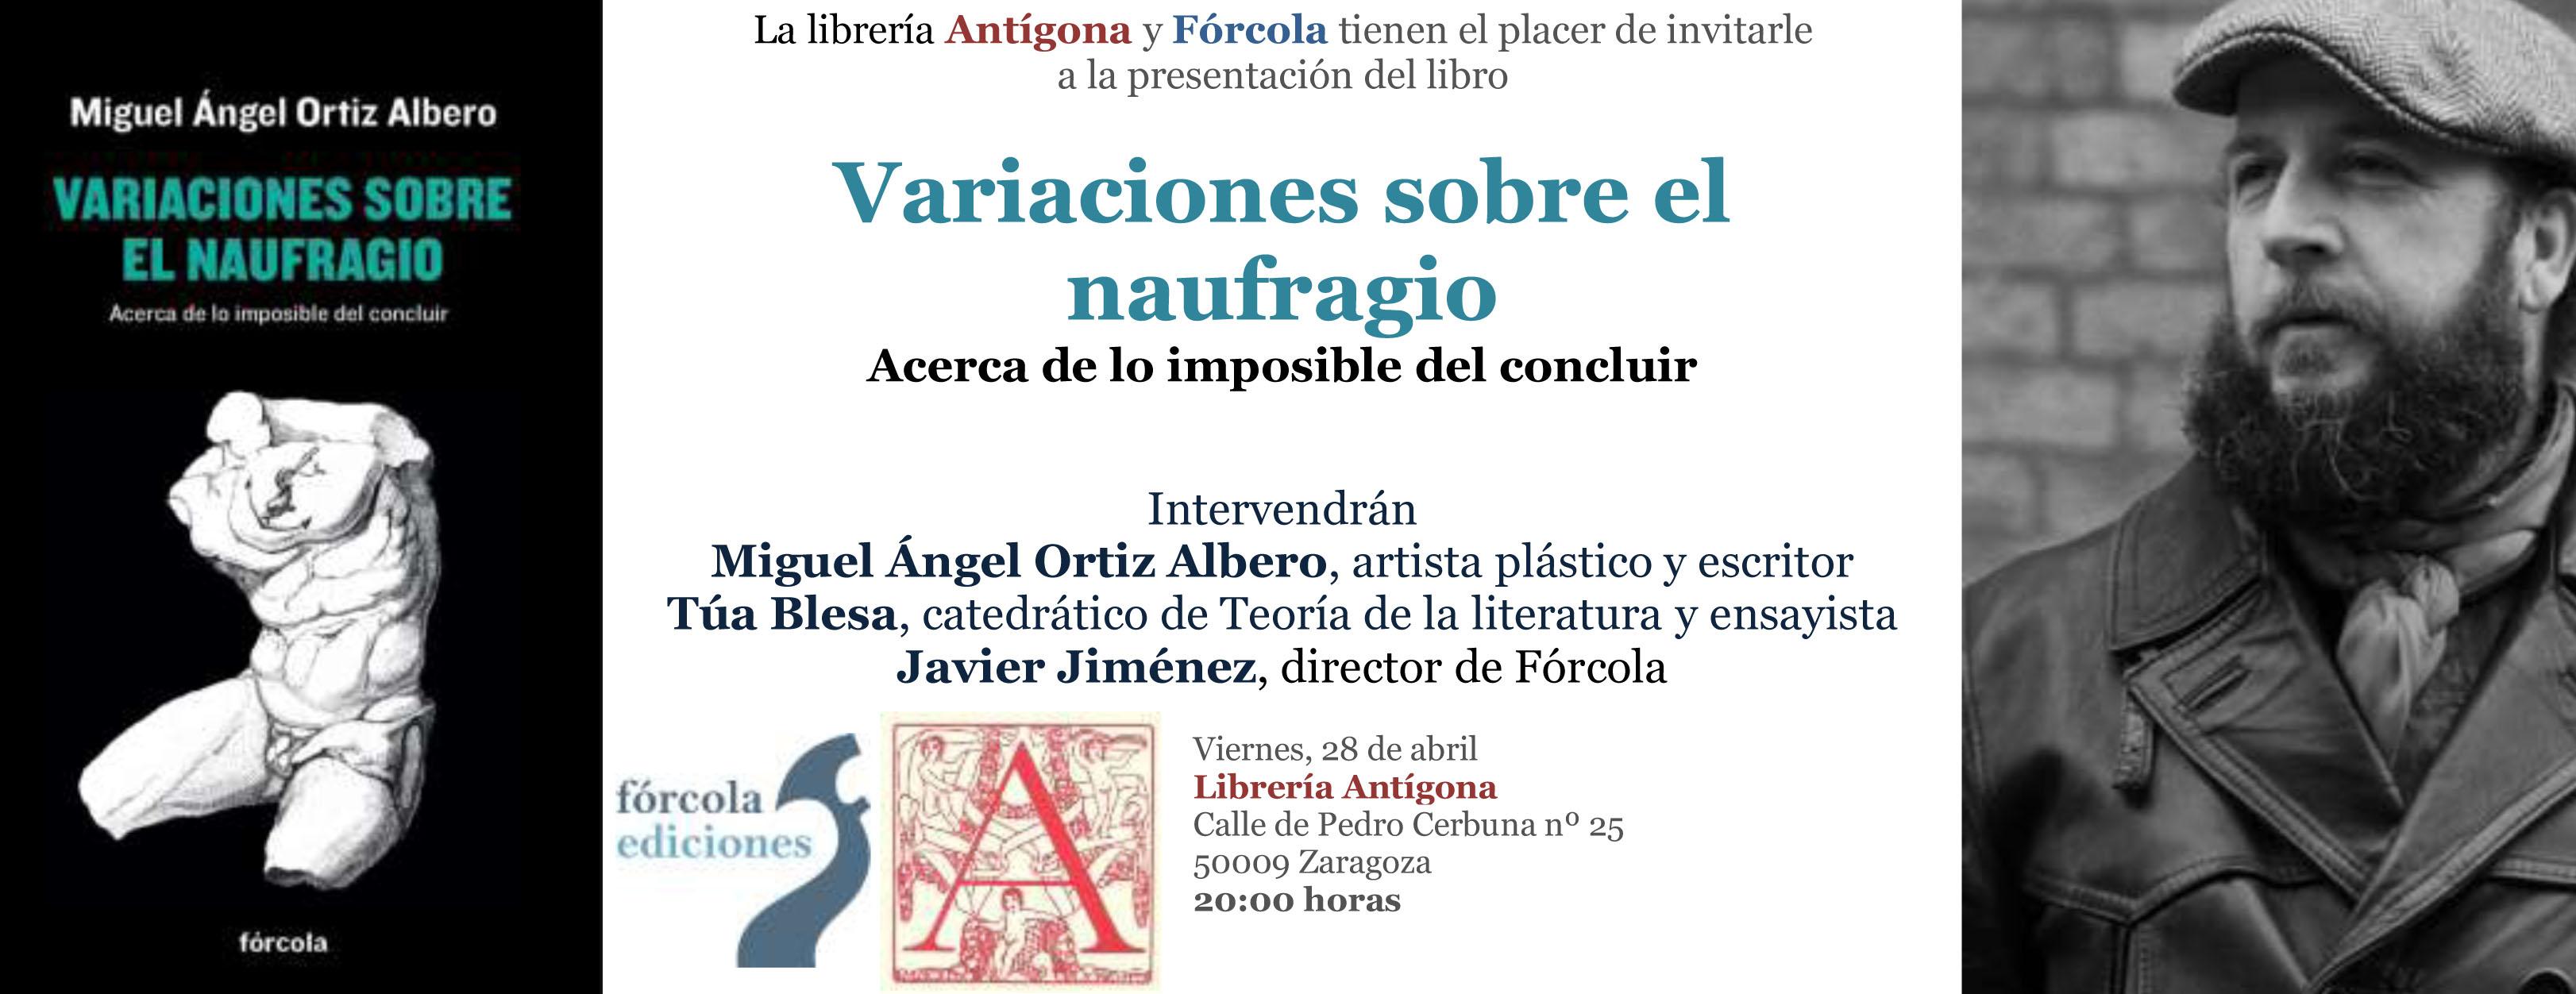 Invitacion_Naufragio_Antigona_Zaragoza